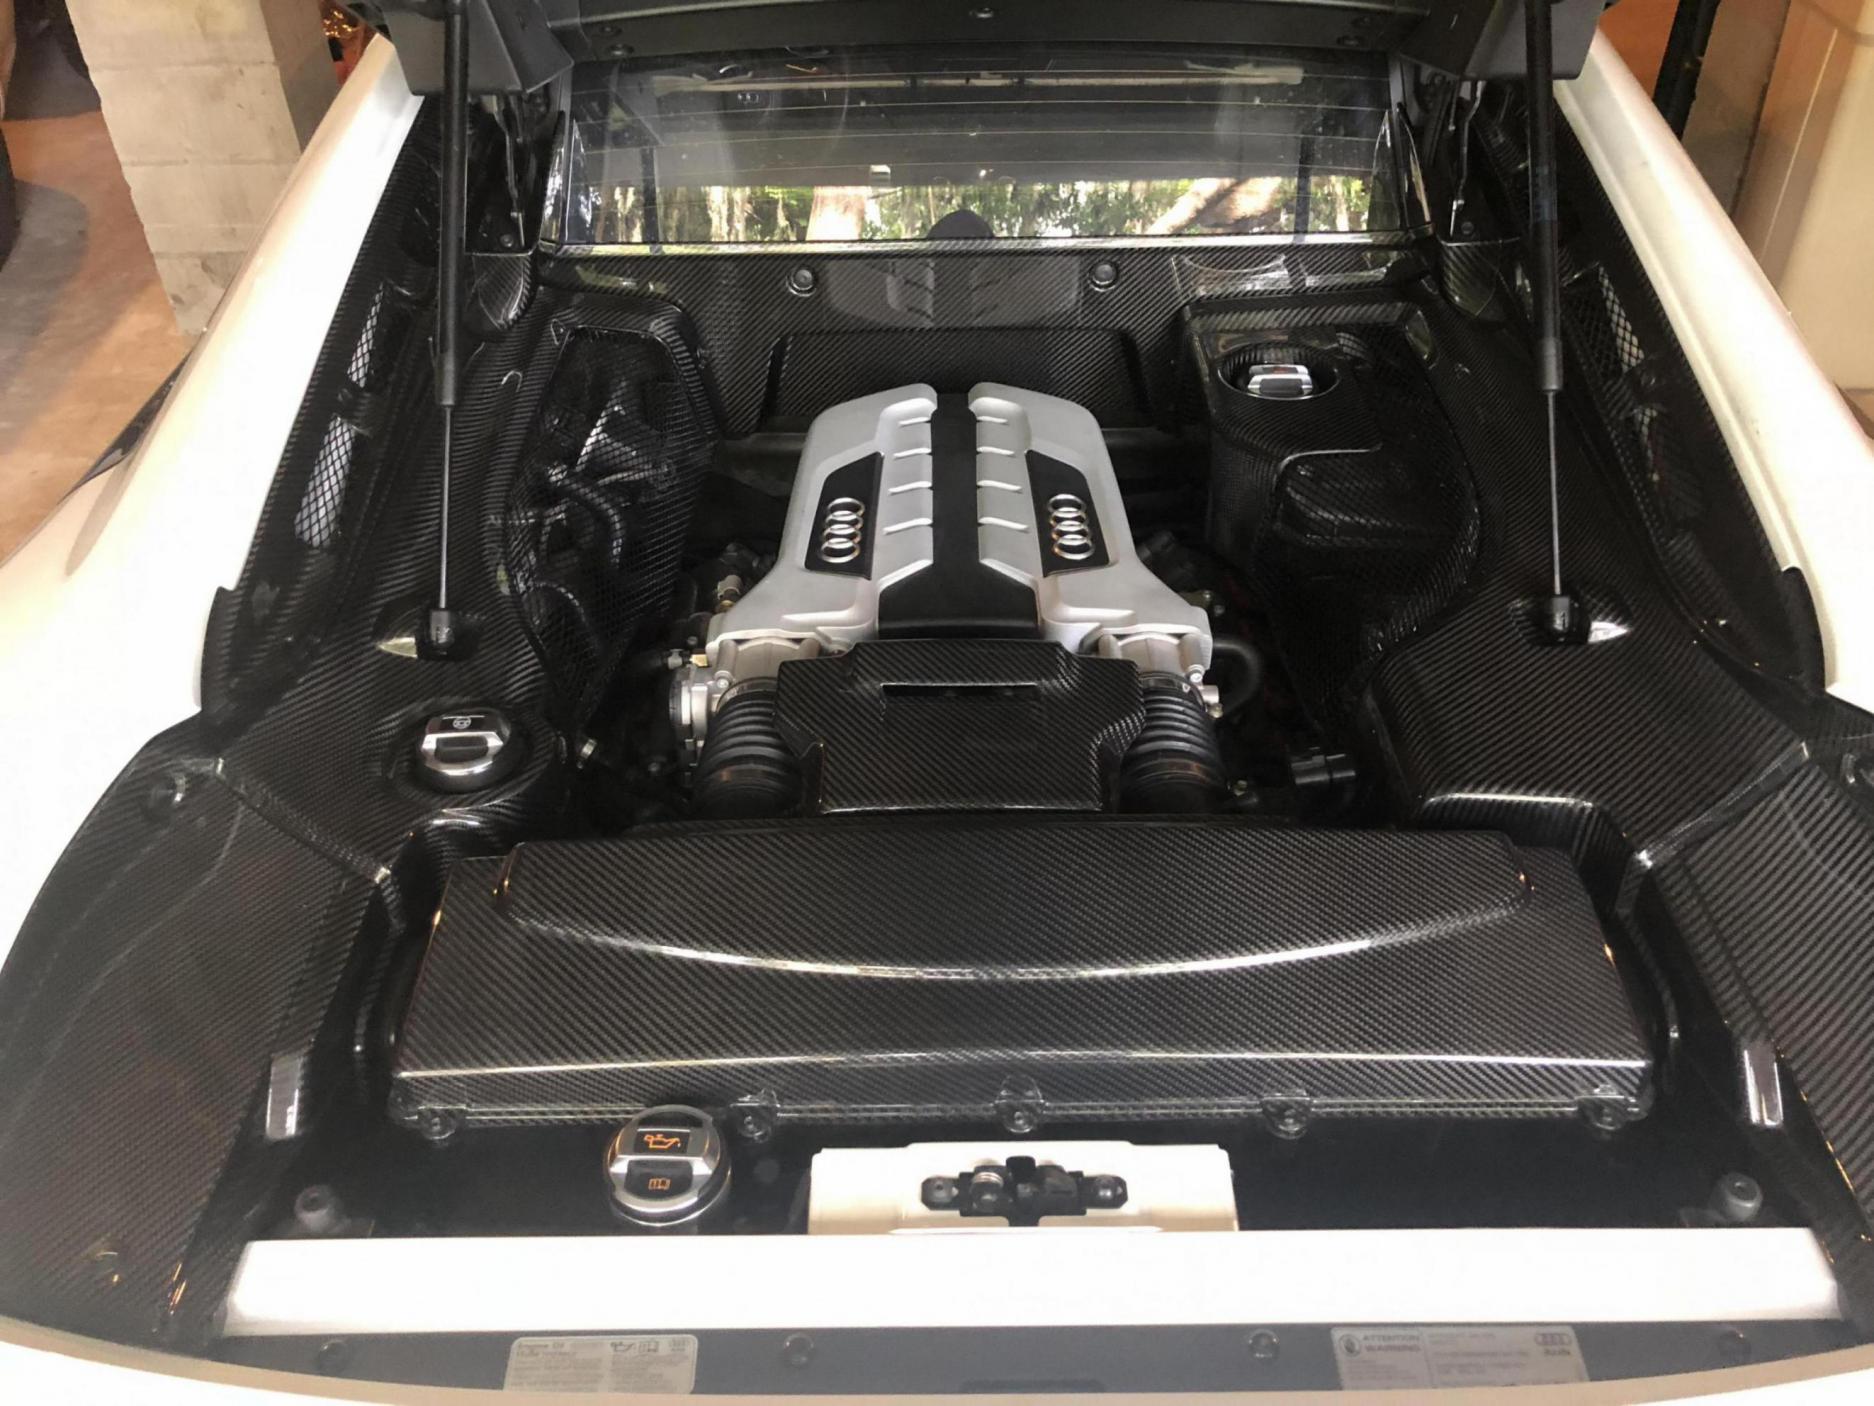 NEW Carbon fiber engine bay V8-d5e40499-15a9-4e72-a418-45c38e87ec30_1528505947151.jpg